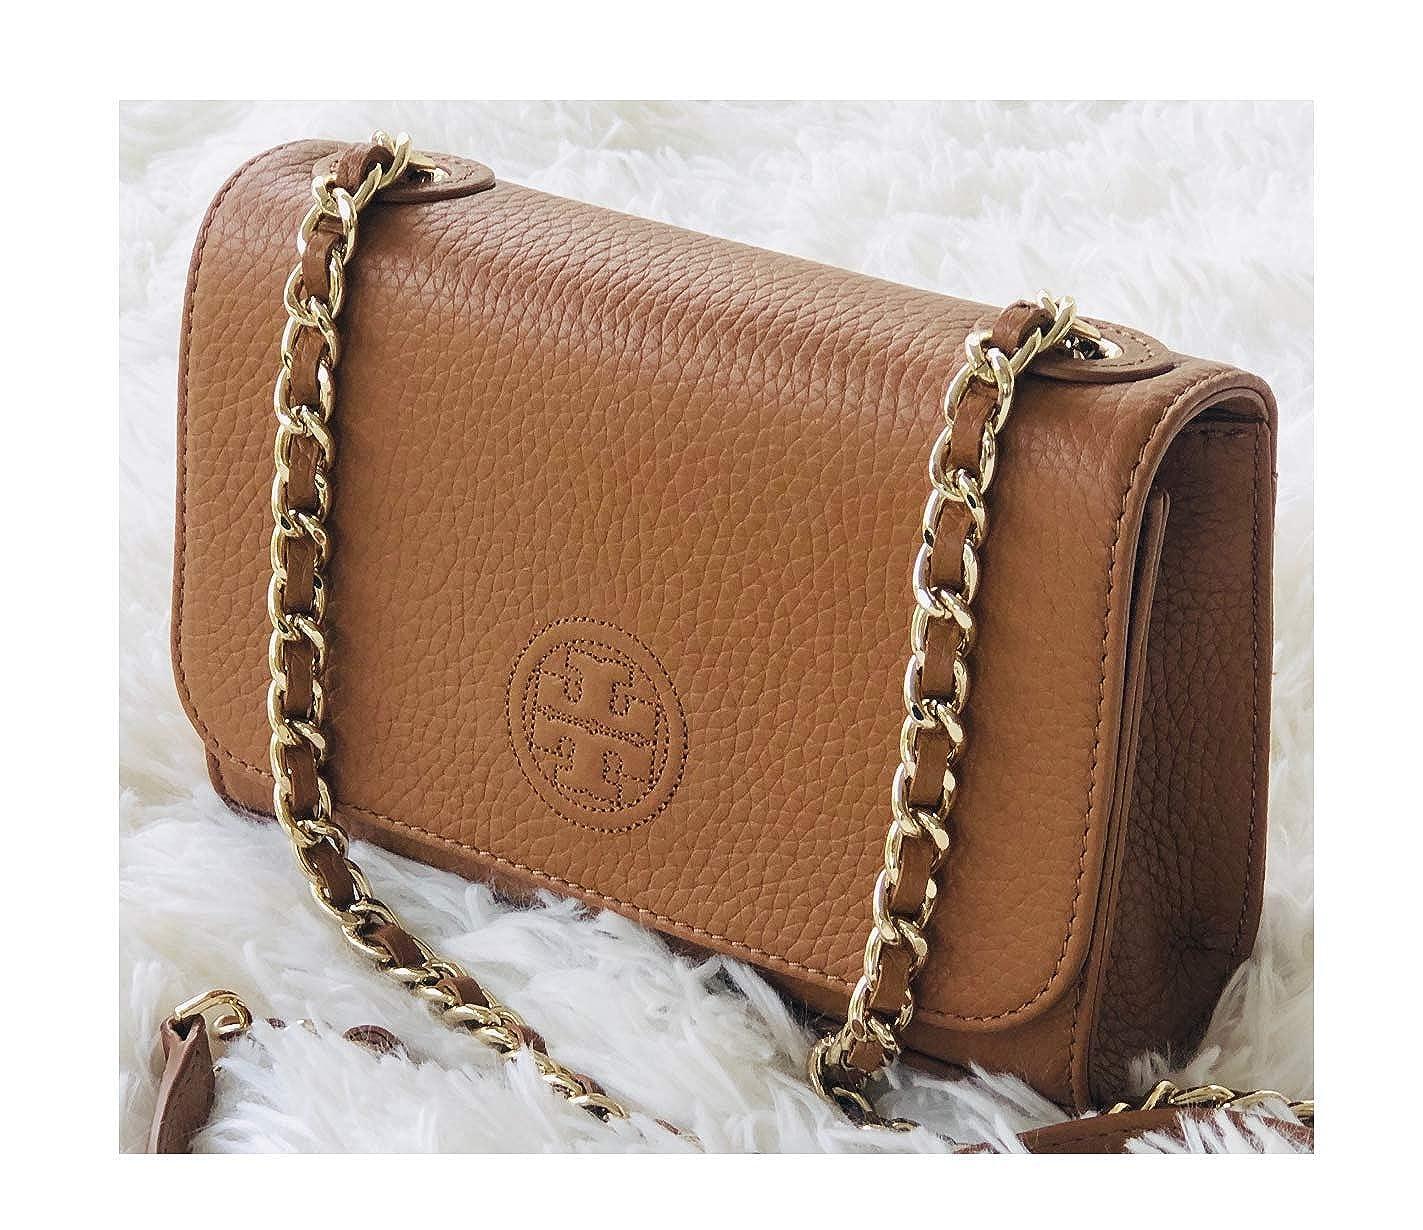 dddba5a935f Tory Burch Bombe Shrunken Shoulder Bag Women's Handbag Brown: Handbags:  Amazon.com